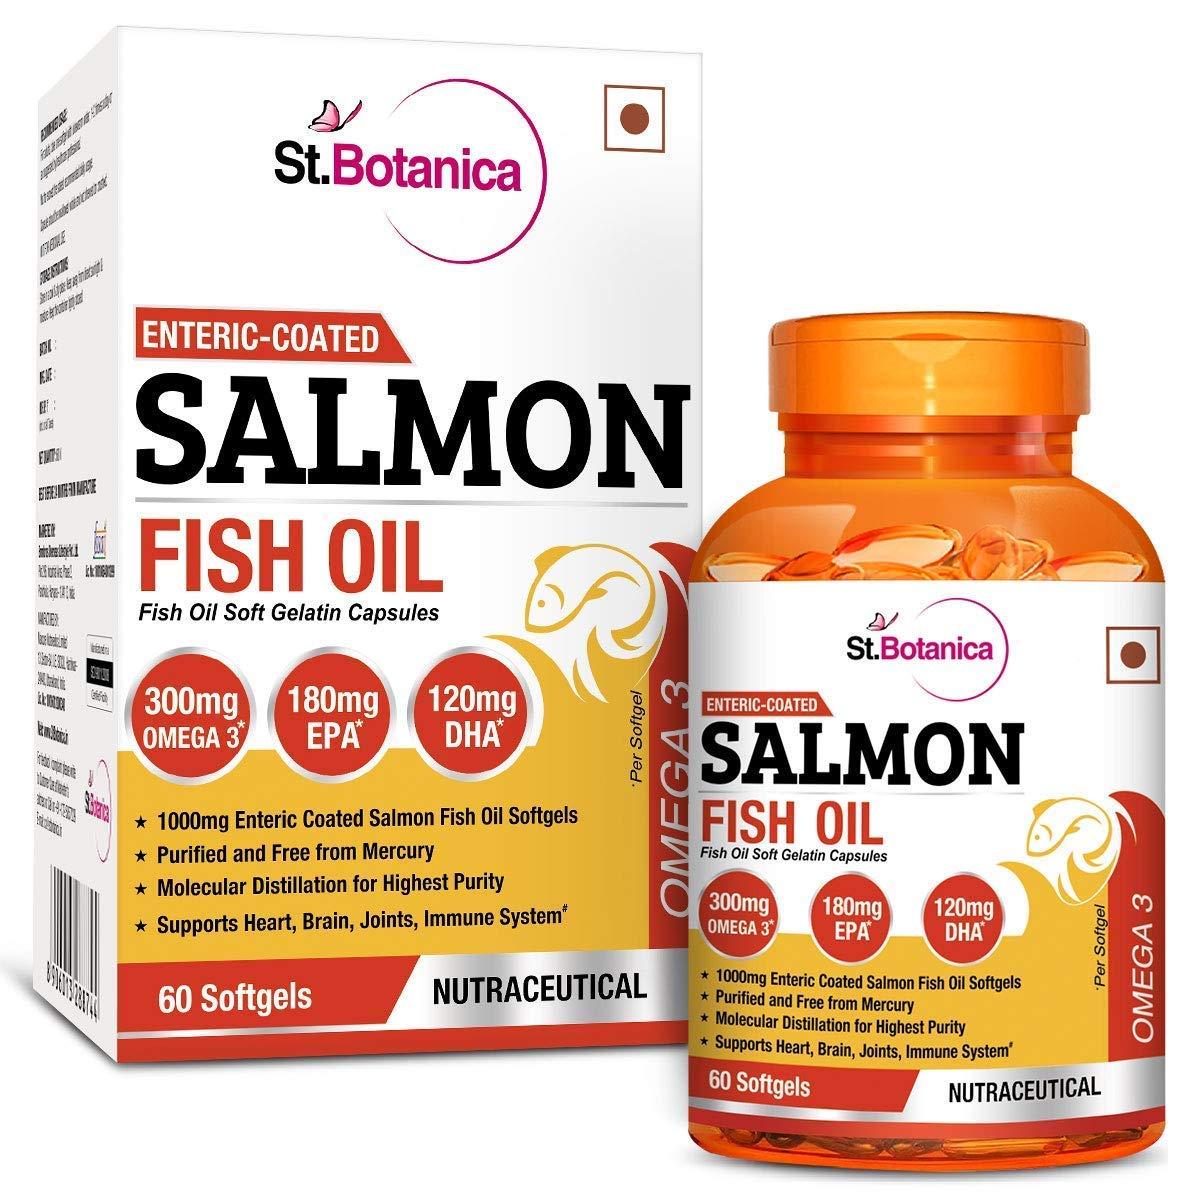 StBotanica Salmon Fish Oil Omega-3 1000mg, 180mg EPA, 120mg DHA - 60 Enteric Coated Softgels product image